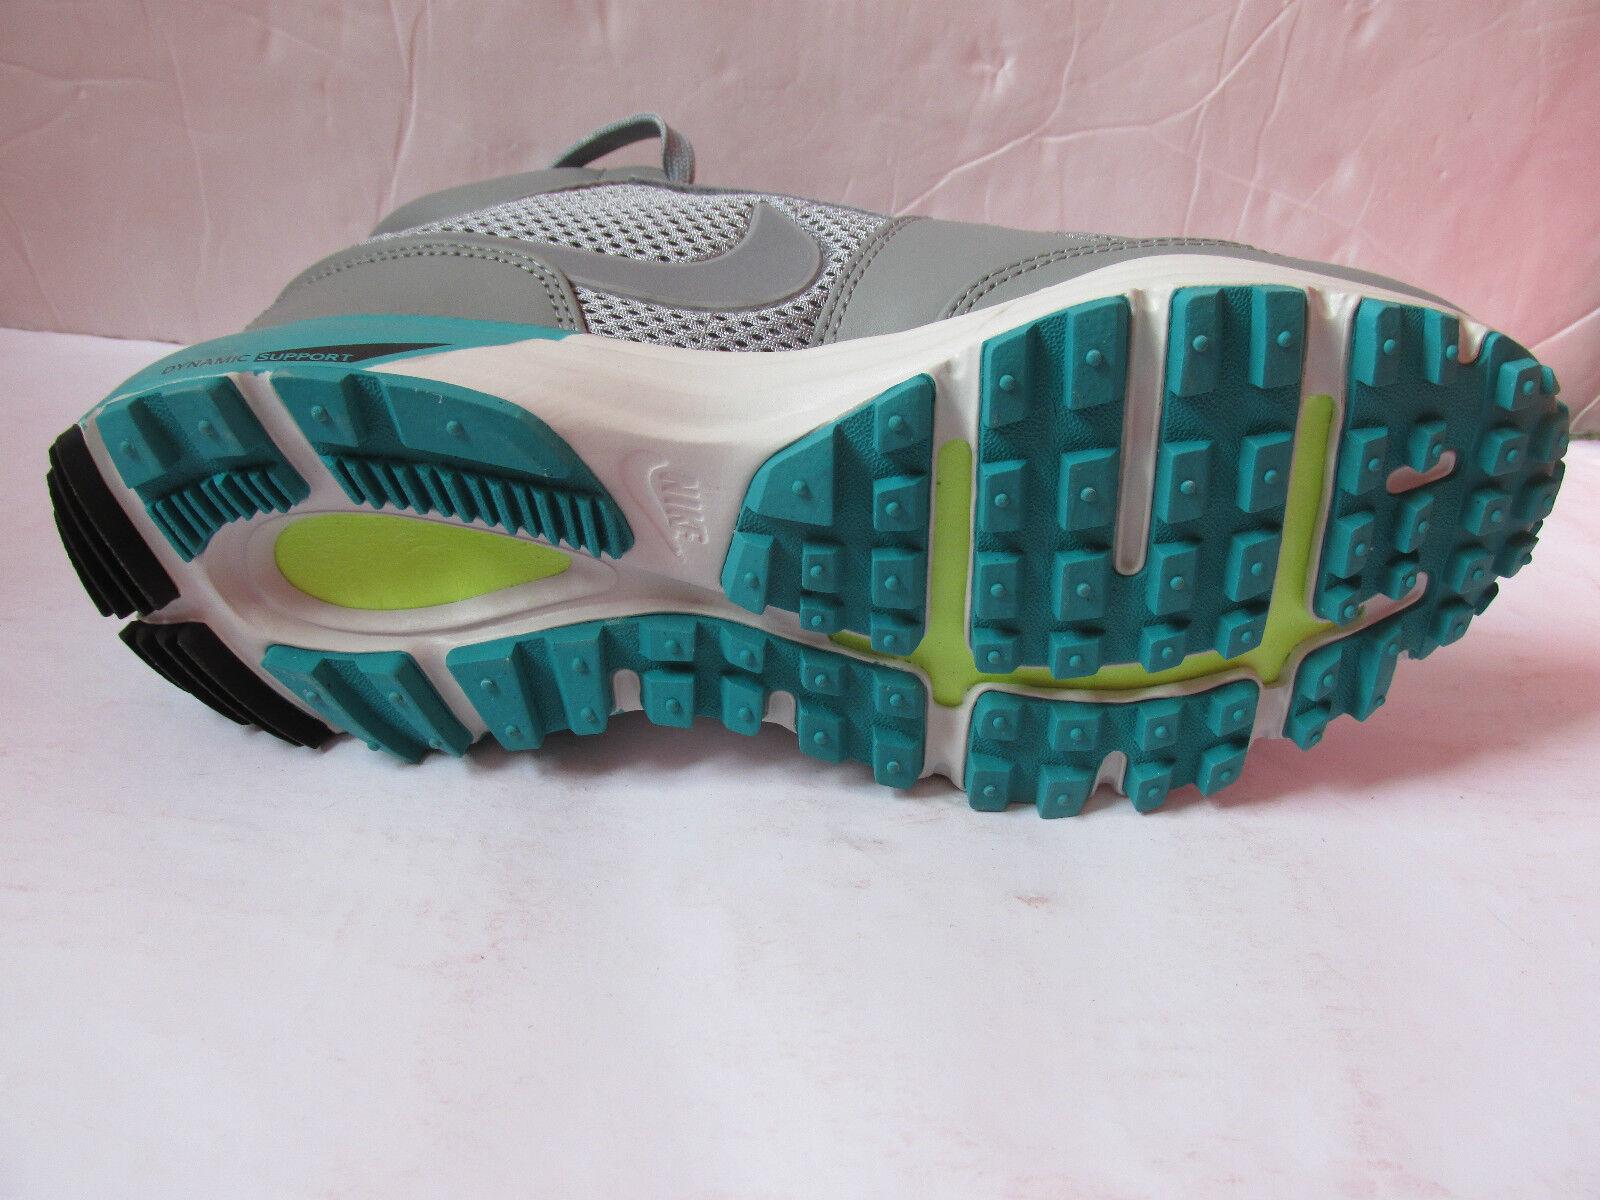 Nike Lunar LDV Stiefel Turnstiefel Sp Herren Hohe Stiefel LDV 646103 Sneakers Sportschuhe a82e4d